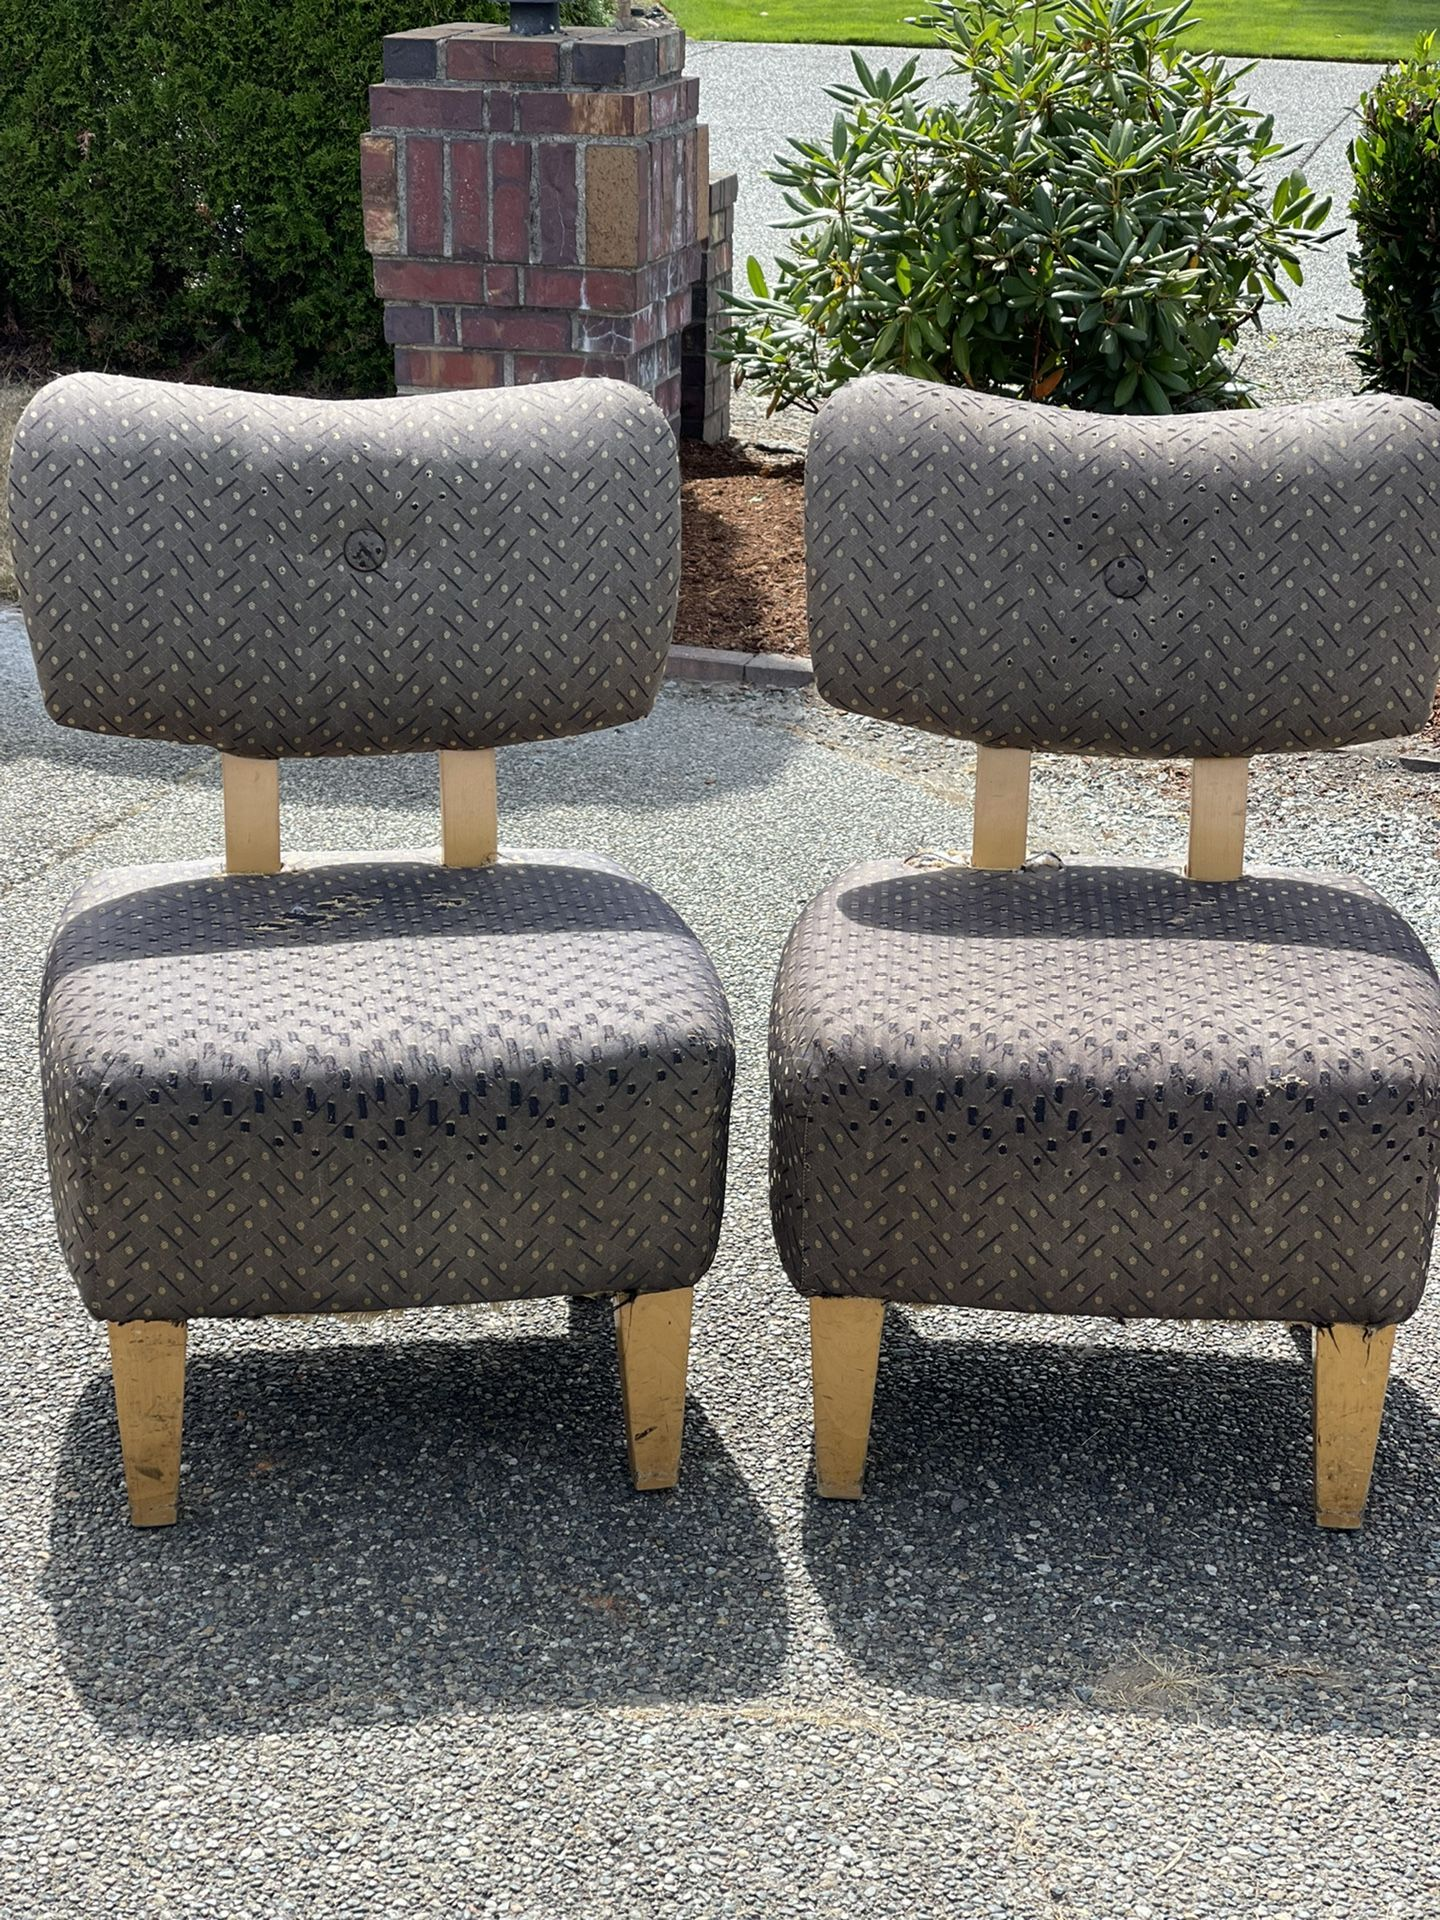 Super Cute Chairs